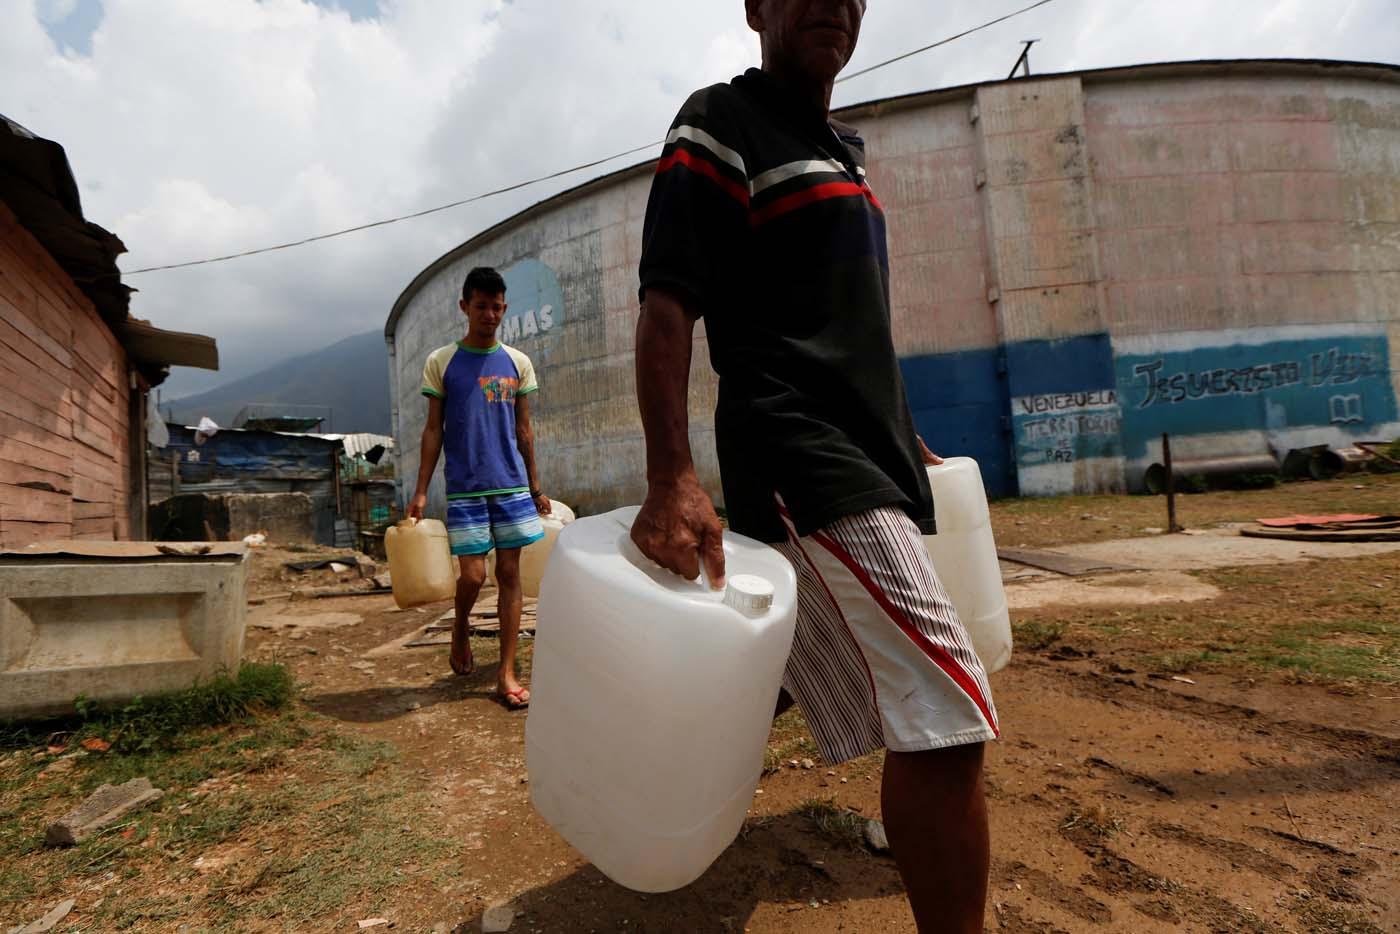 Escasez de agua en Venezuela/Reuters